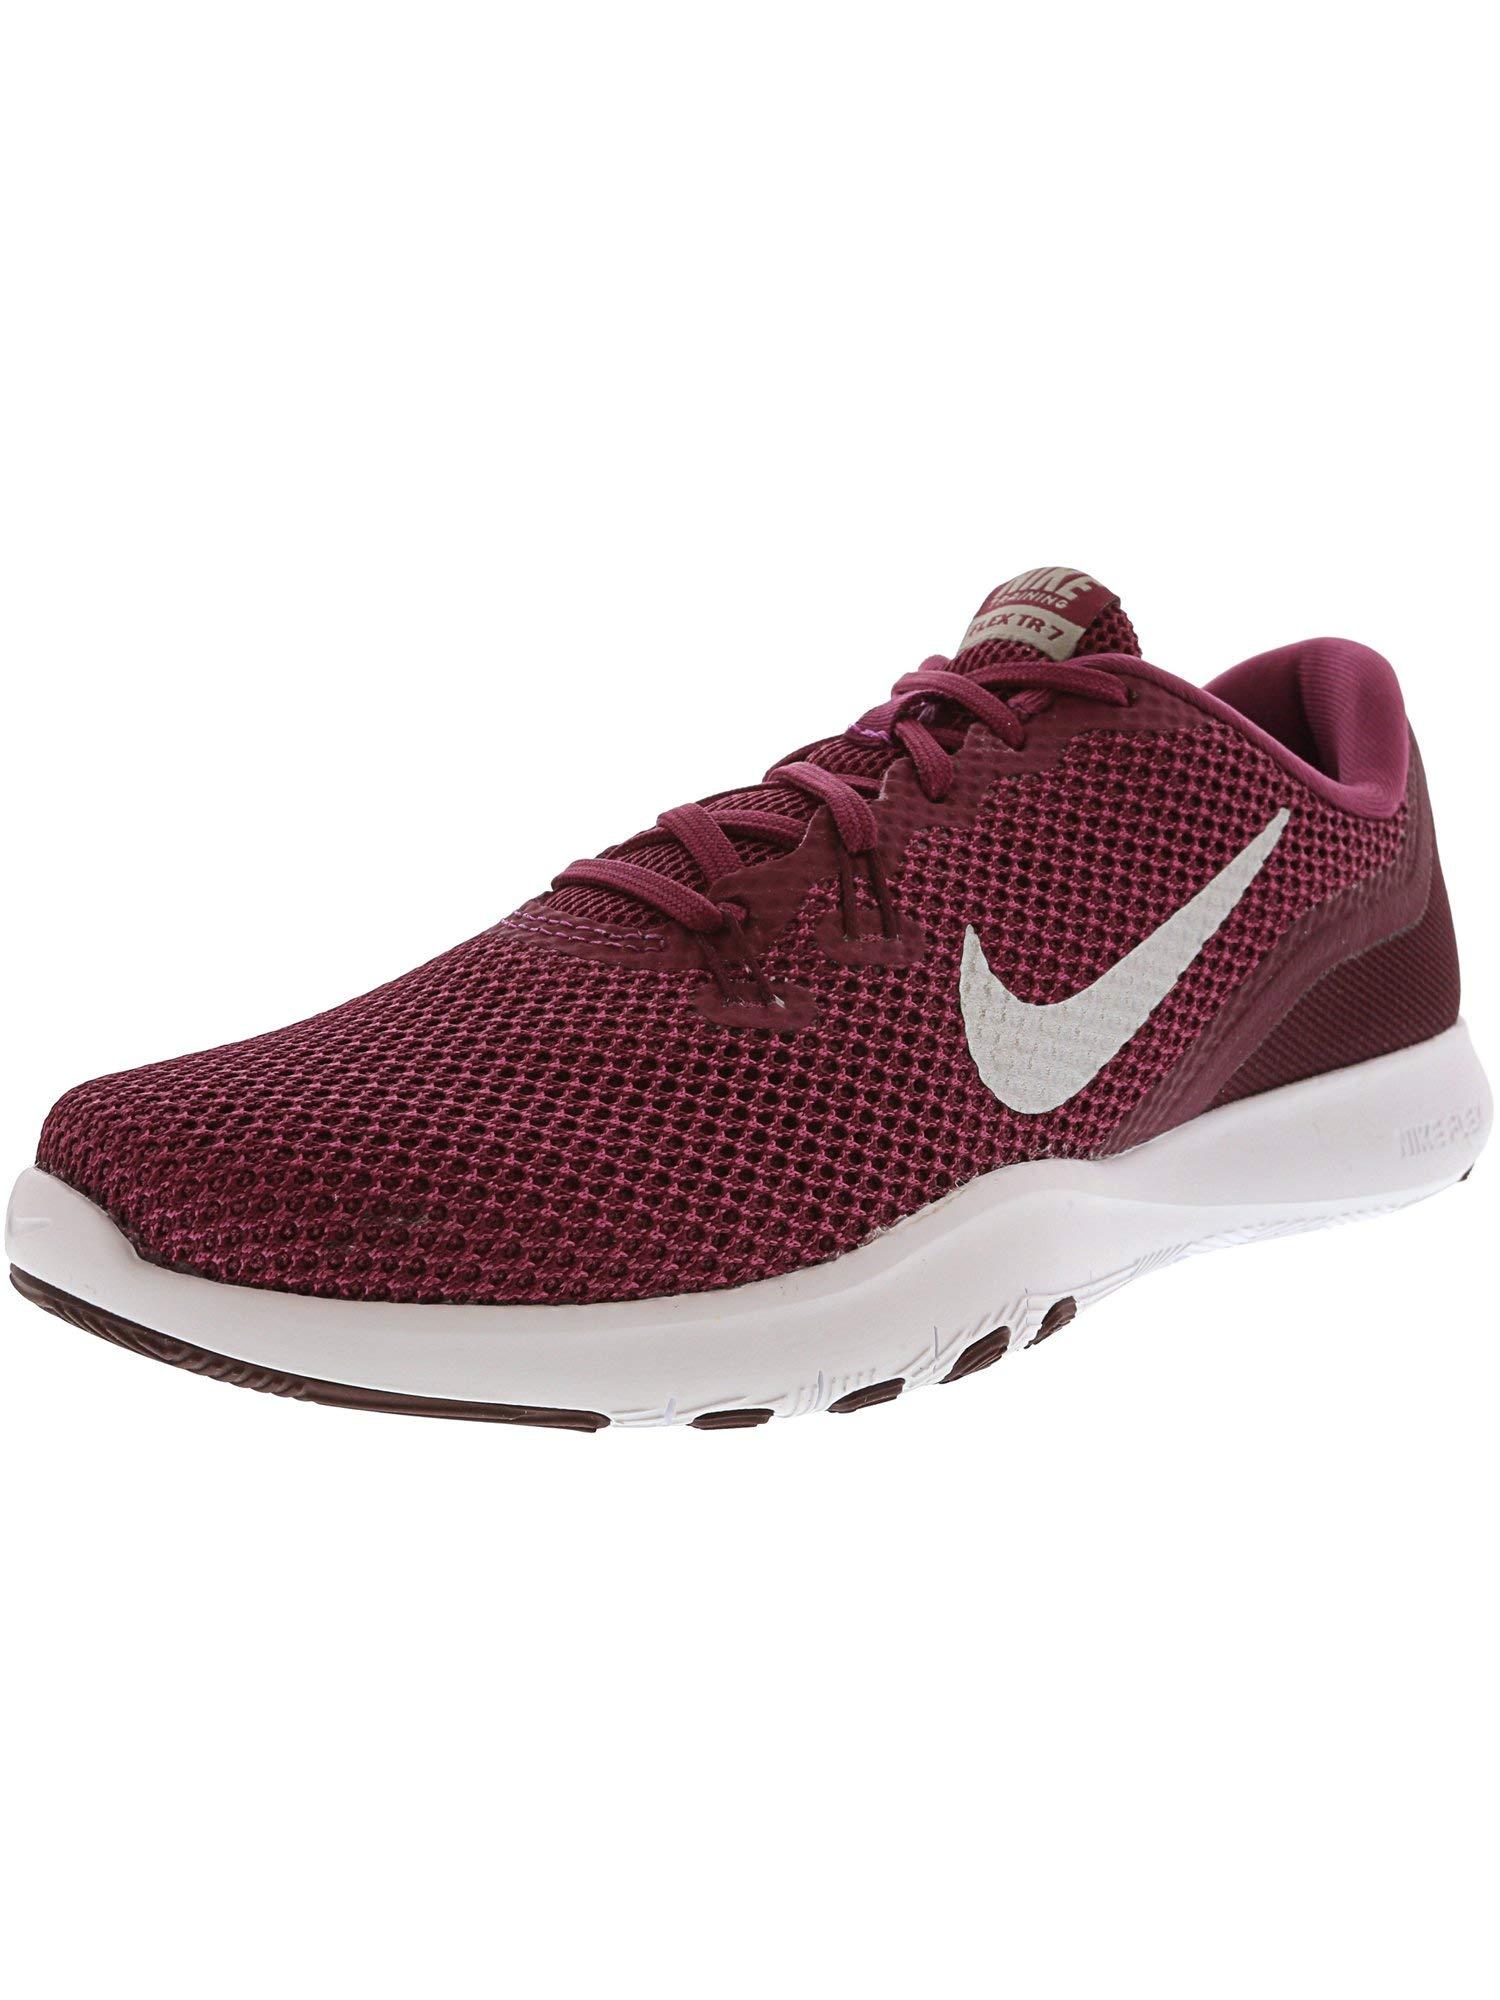 af885e14ab46a Nike Women s Flex TR 7 Training Shoe Tea Berry Metallic Silver Bordeaux Size  8 M US. Nike Women s Flex TR 7 Training Shoe Wolf Grey Racer Pink Stealth  6.5